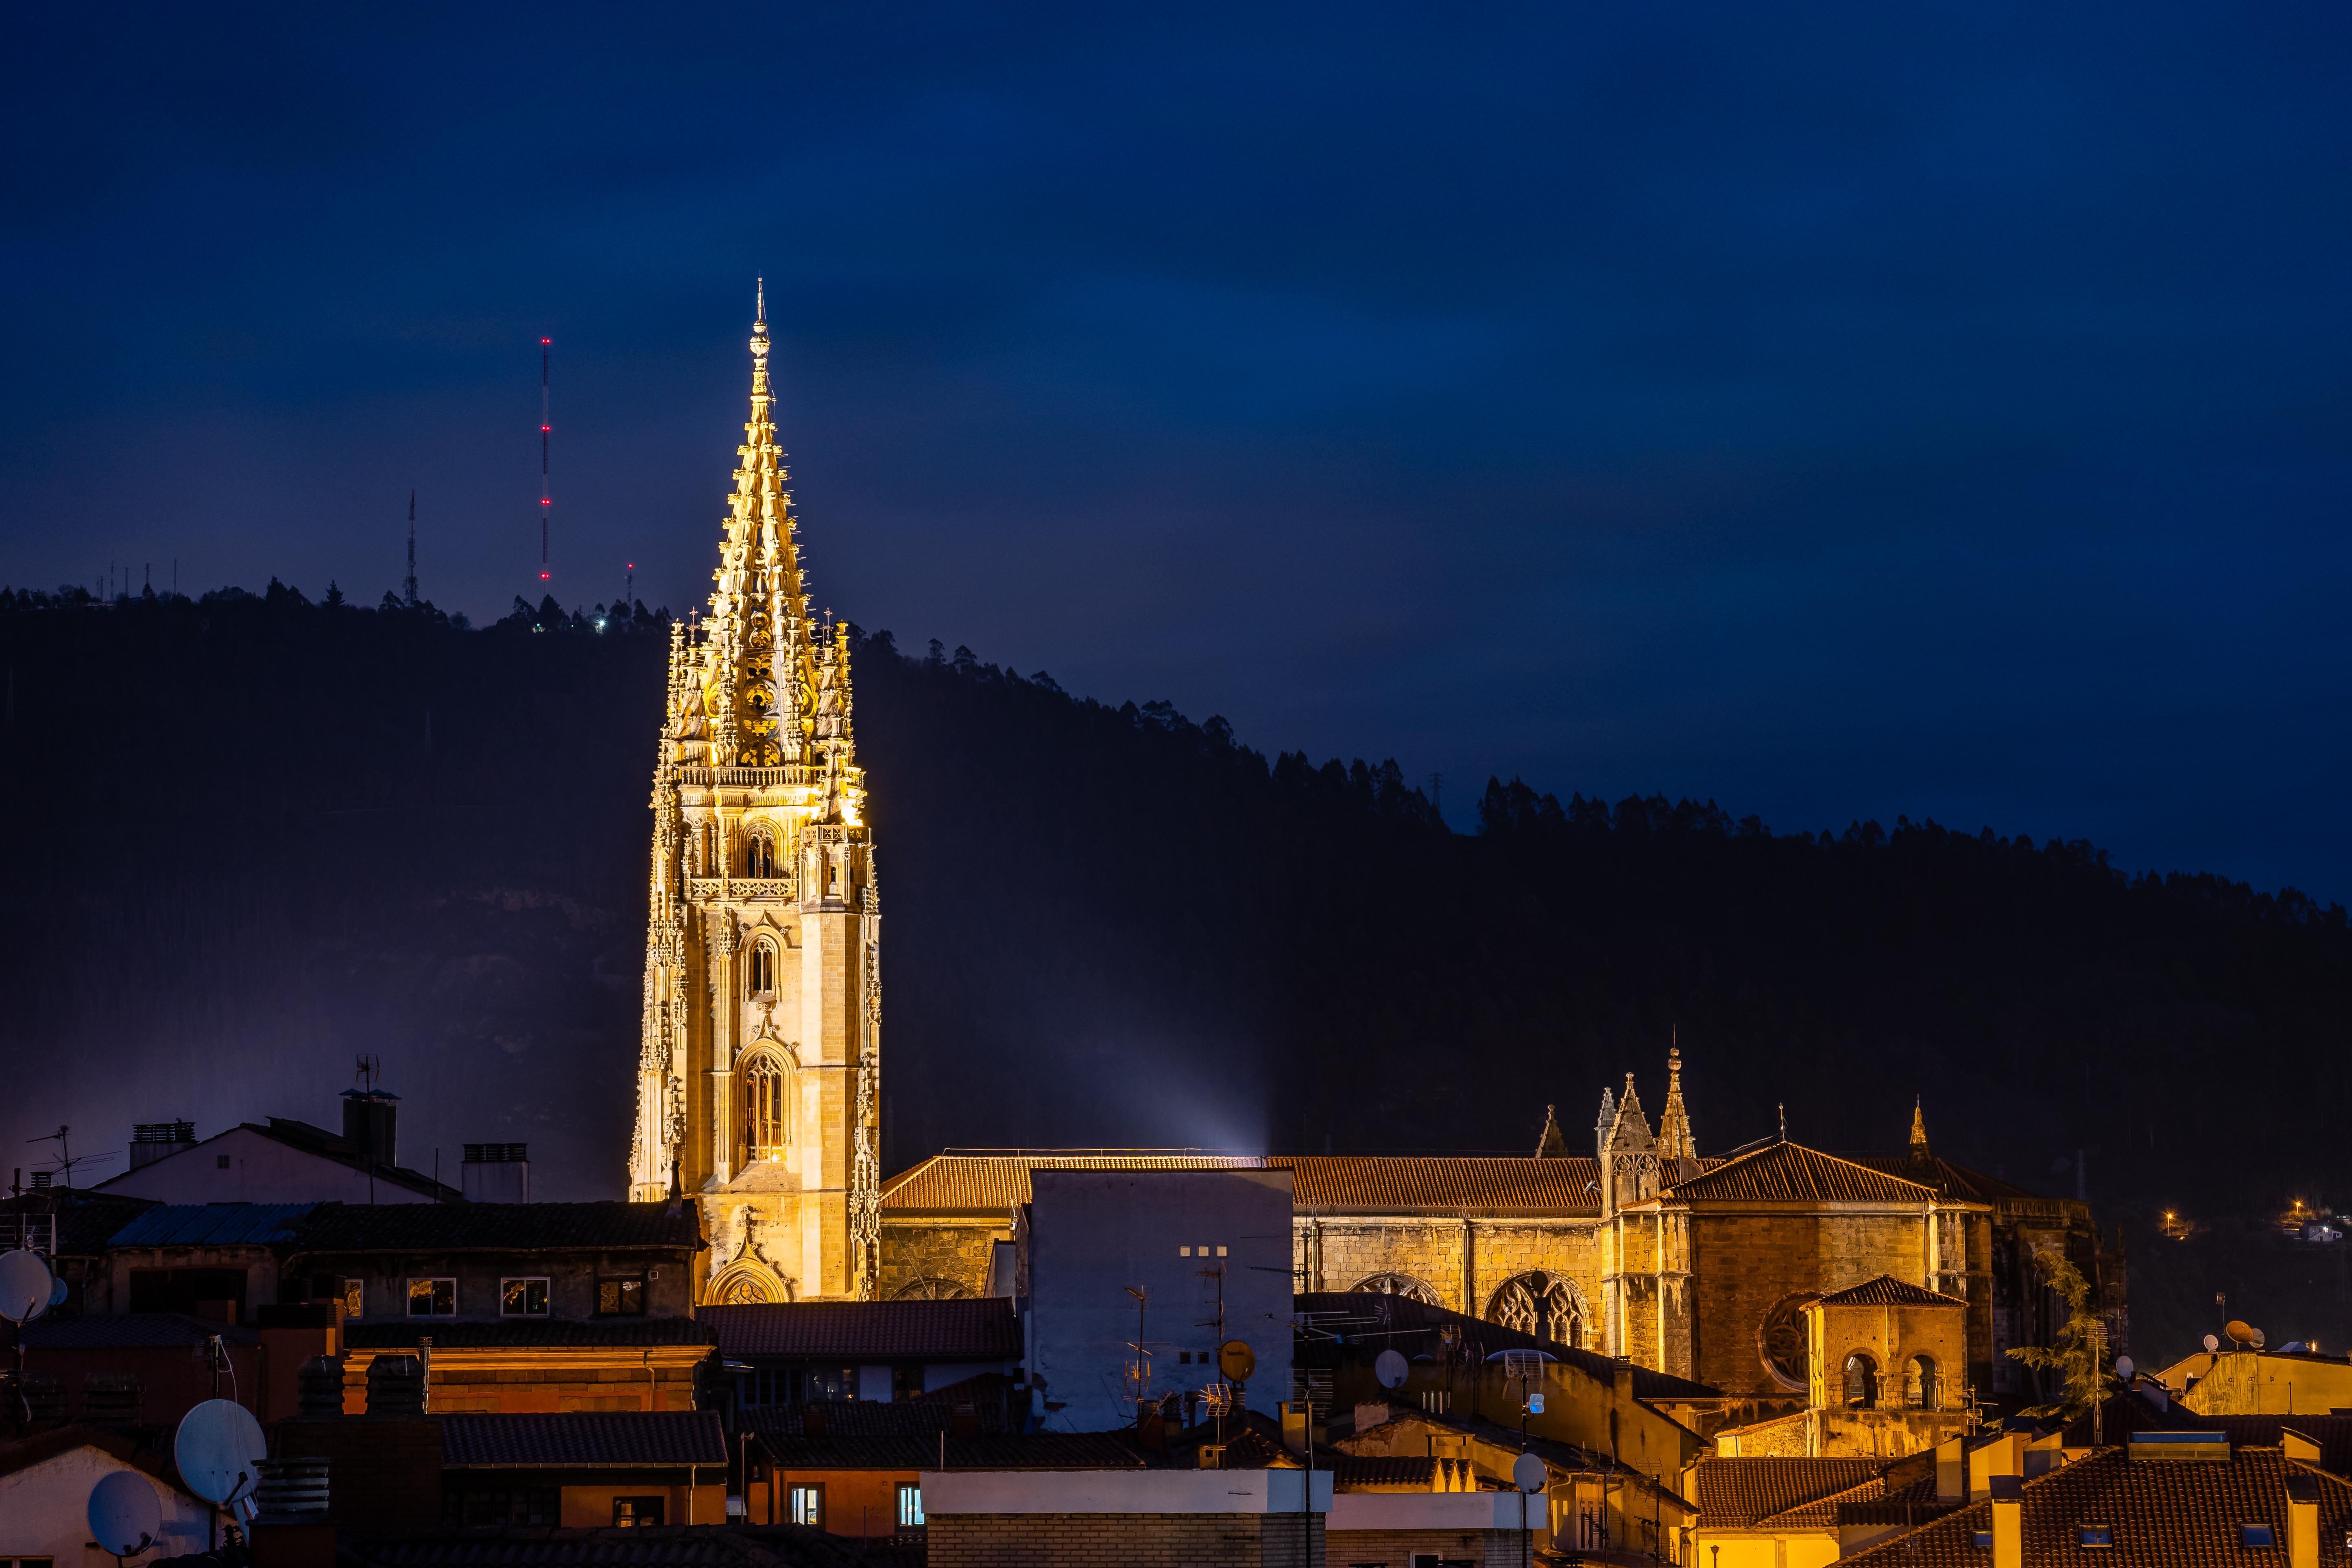 #11/52 Catedral de Oviedo